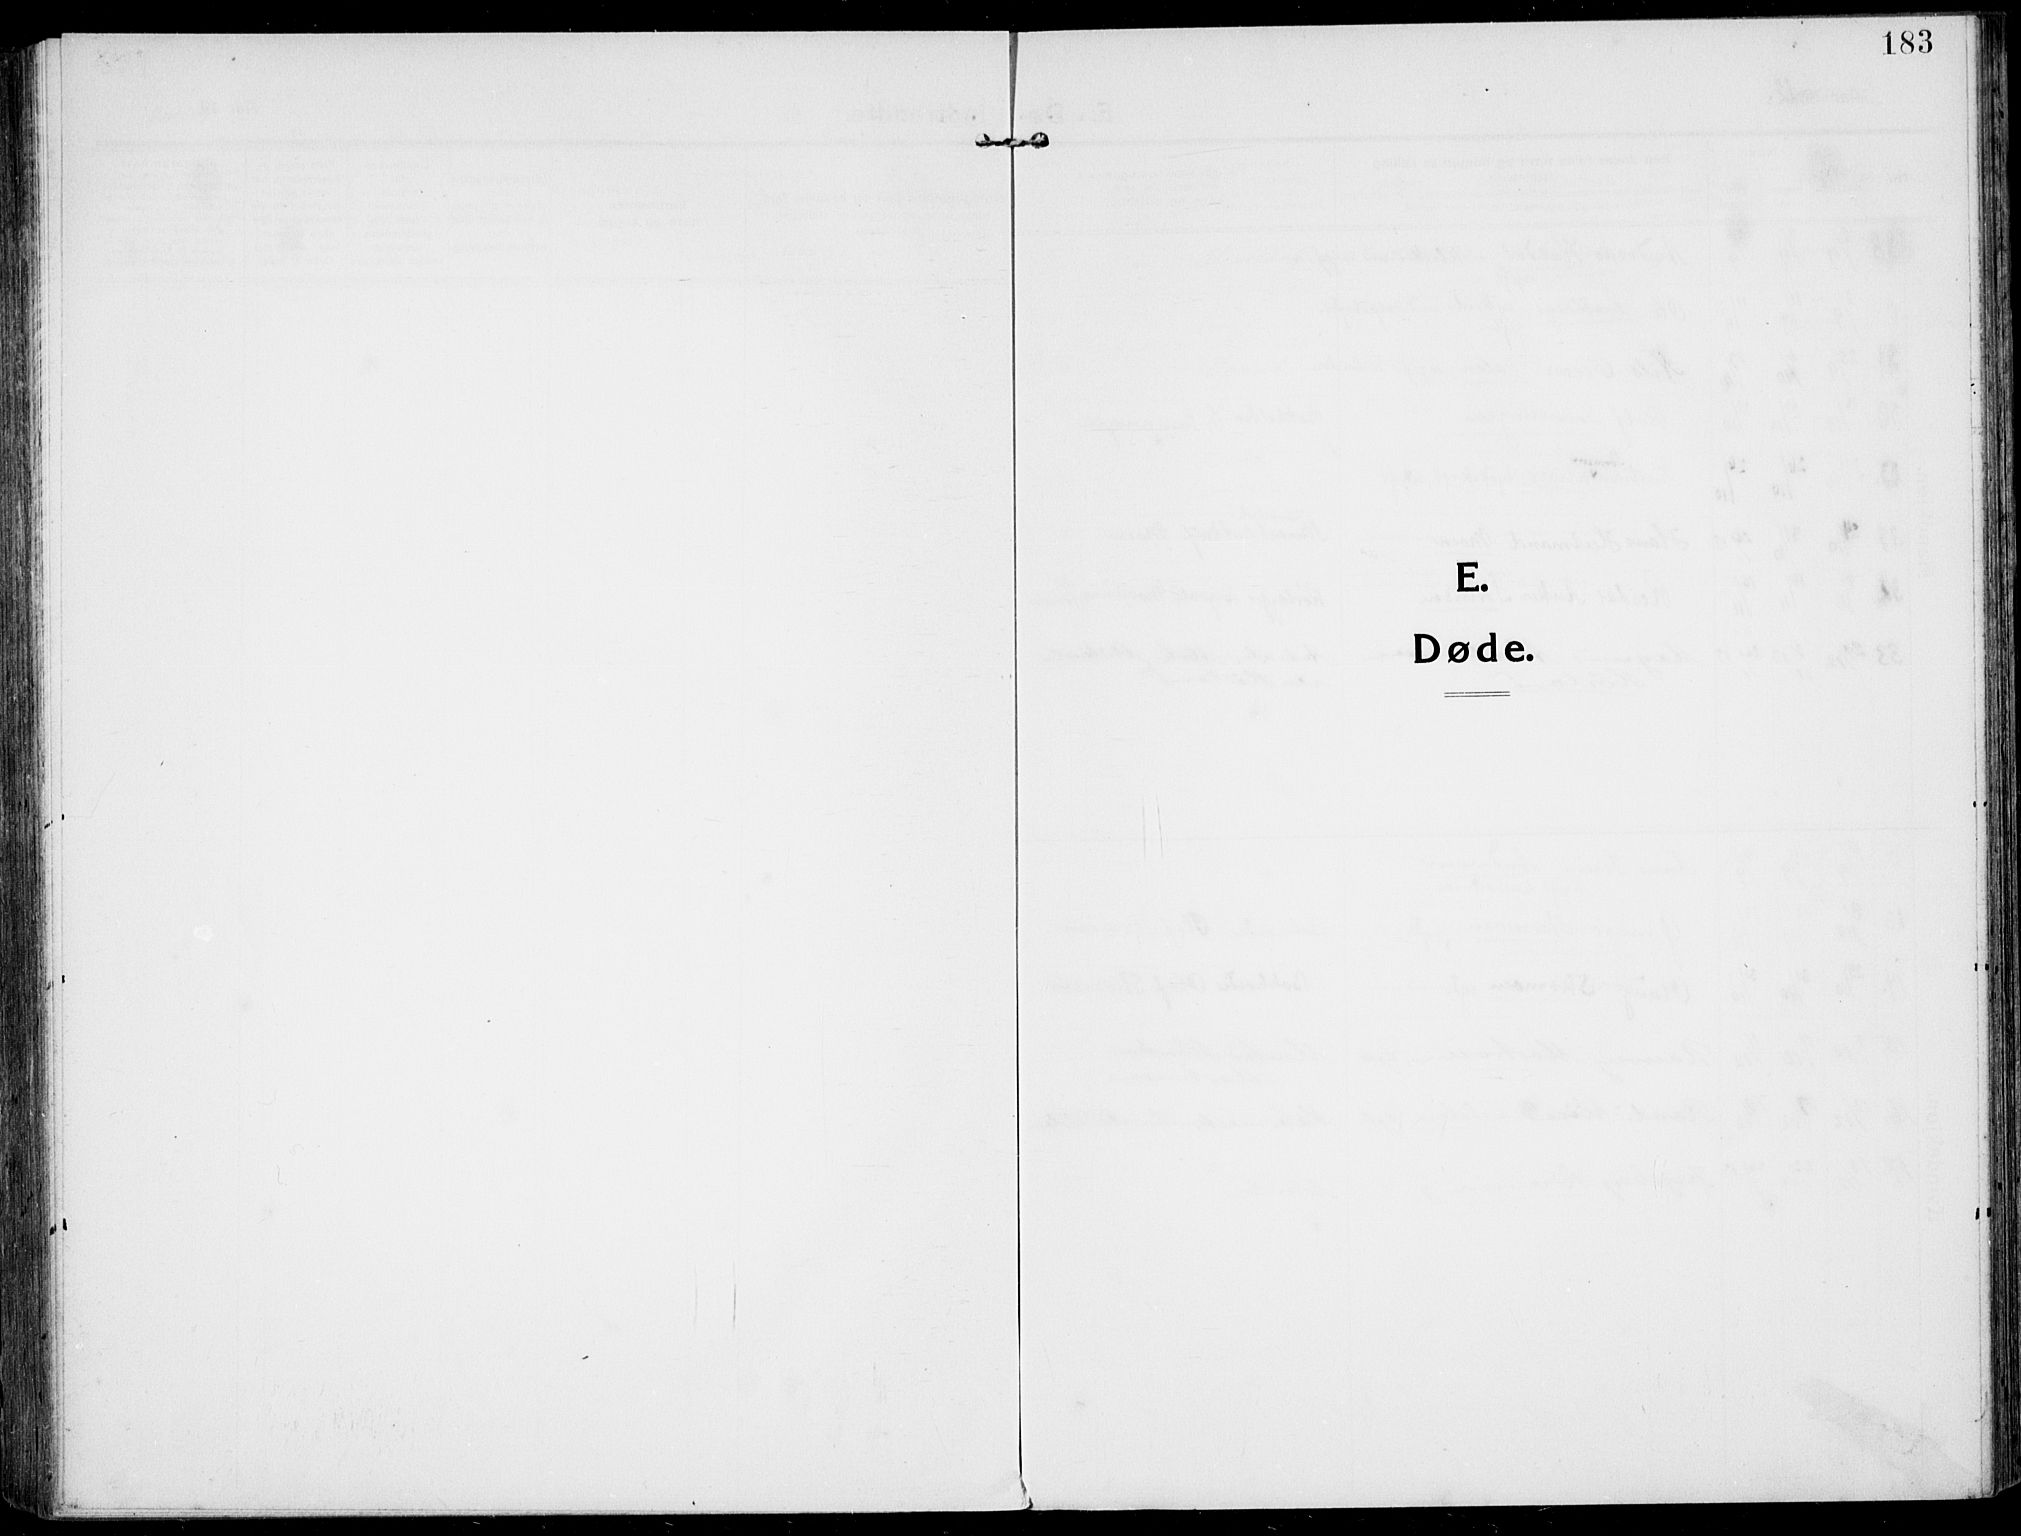 SAKO, Rjukan kirkebøker, F/Fa/L0002: Ministerialbok nr. 2, 1912-1917, s. 183